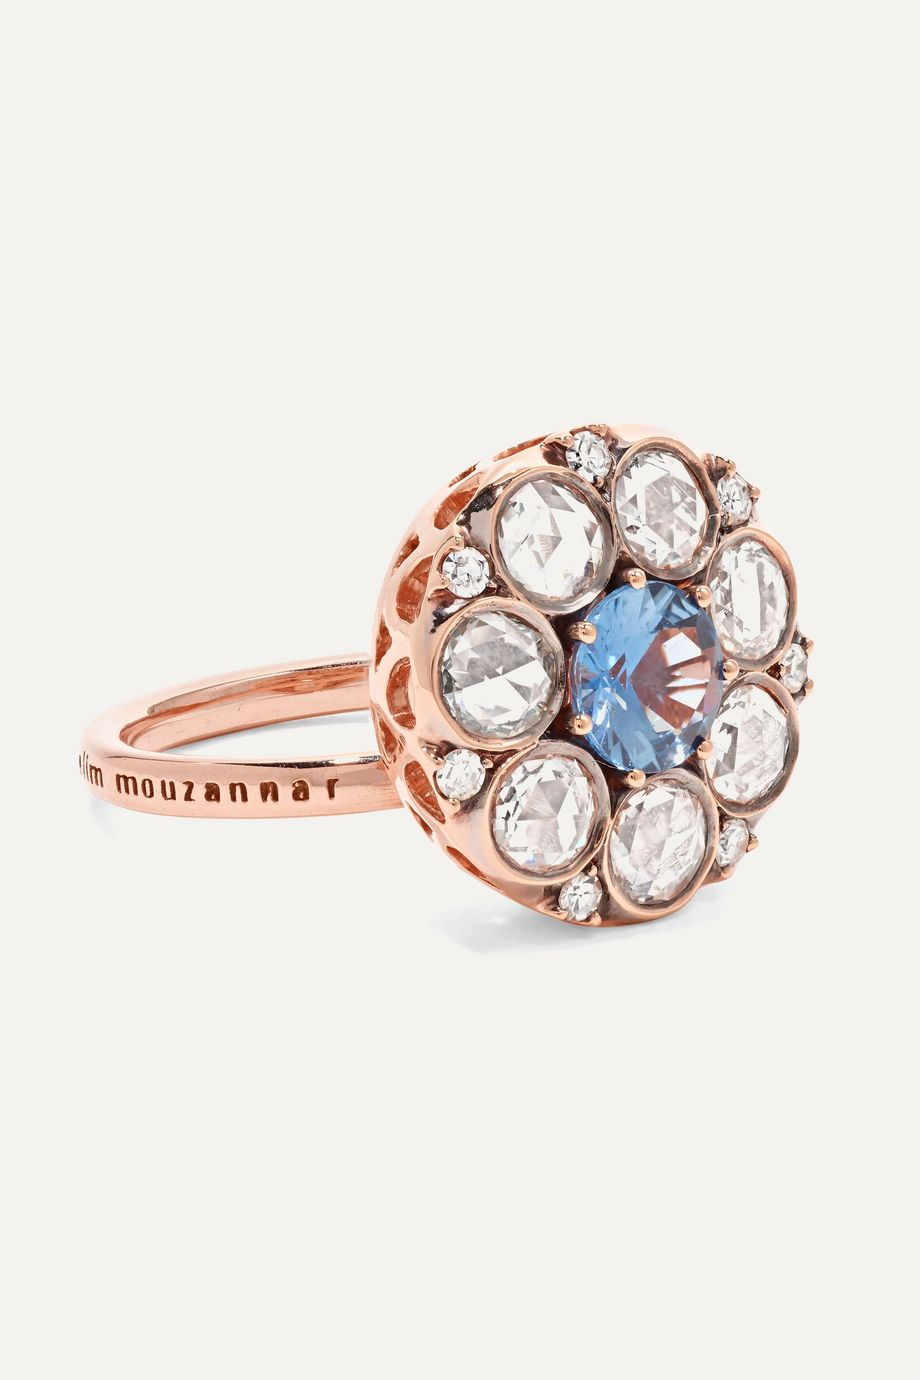 Selim Mouzannar Beirut 18-karat rose gold, diamond and sapphire ring